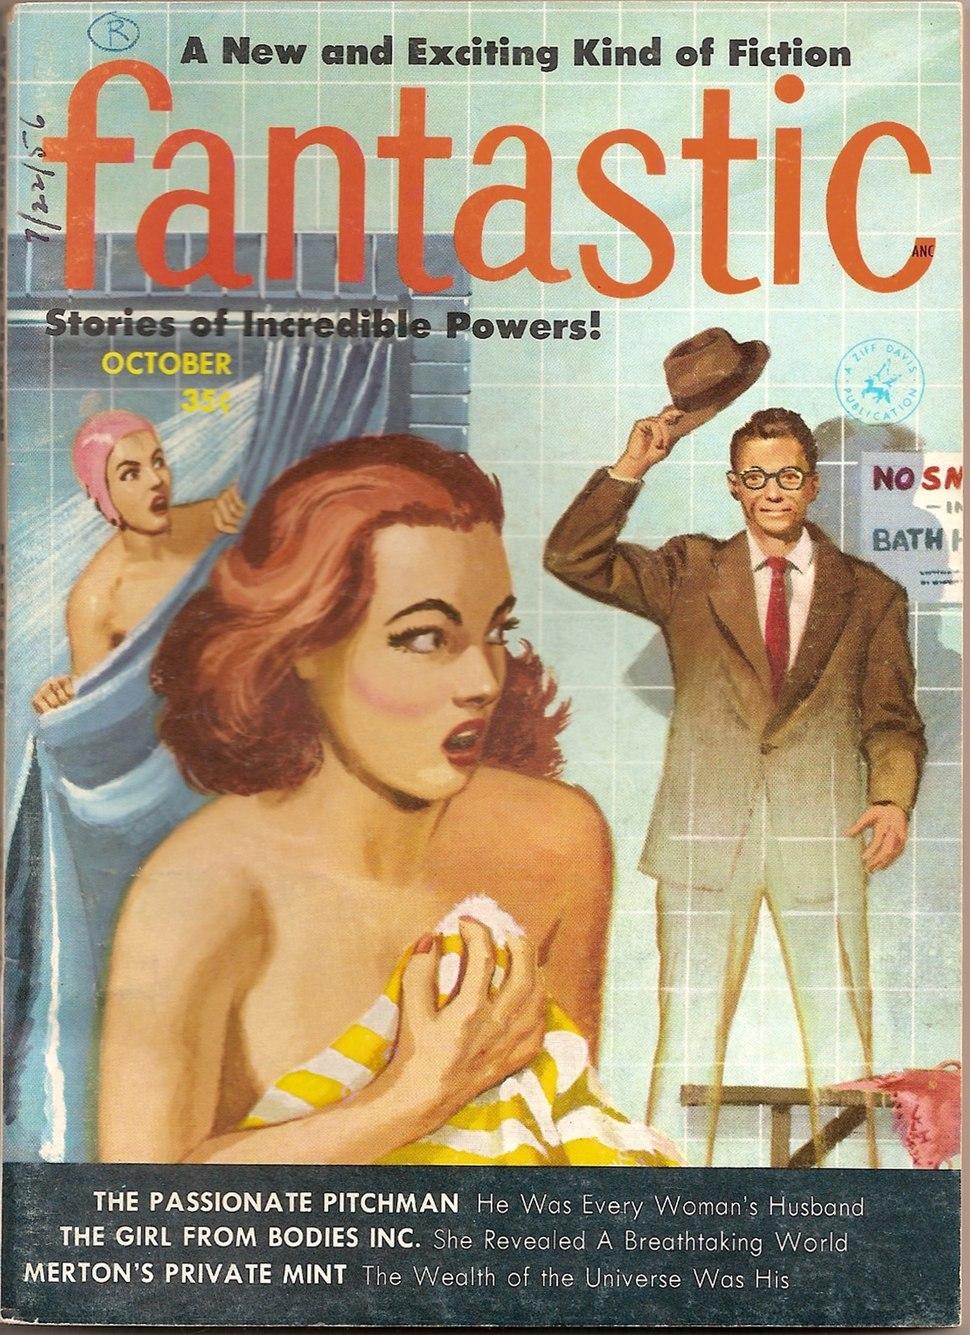 Fantastic October 1956 front